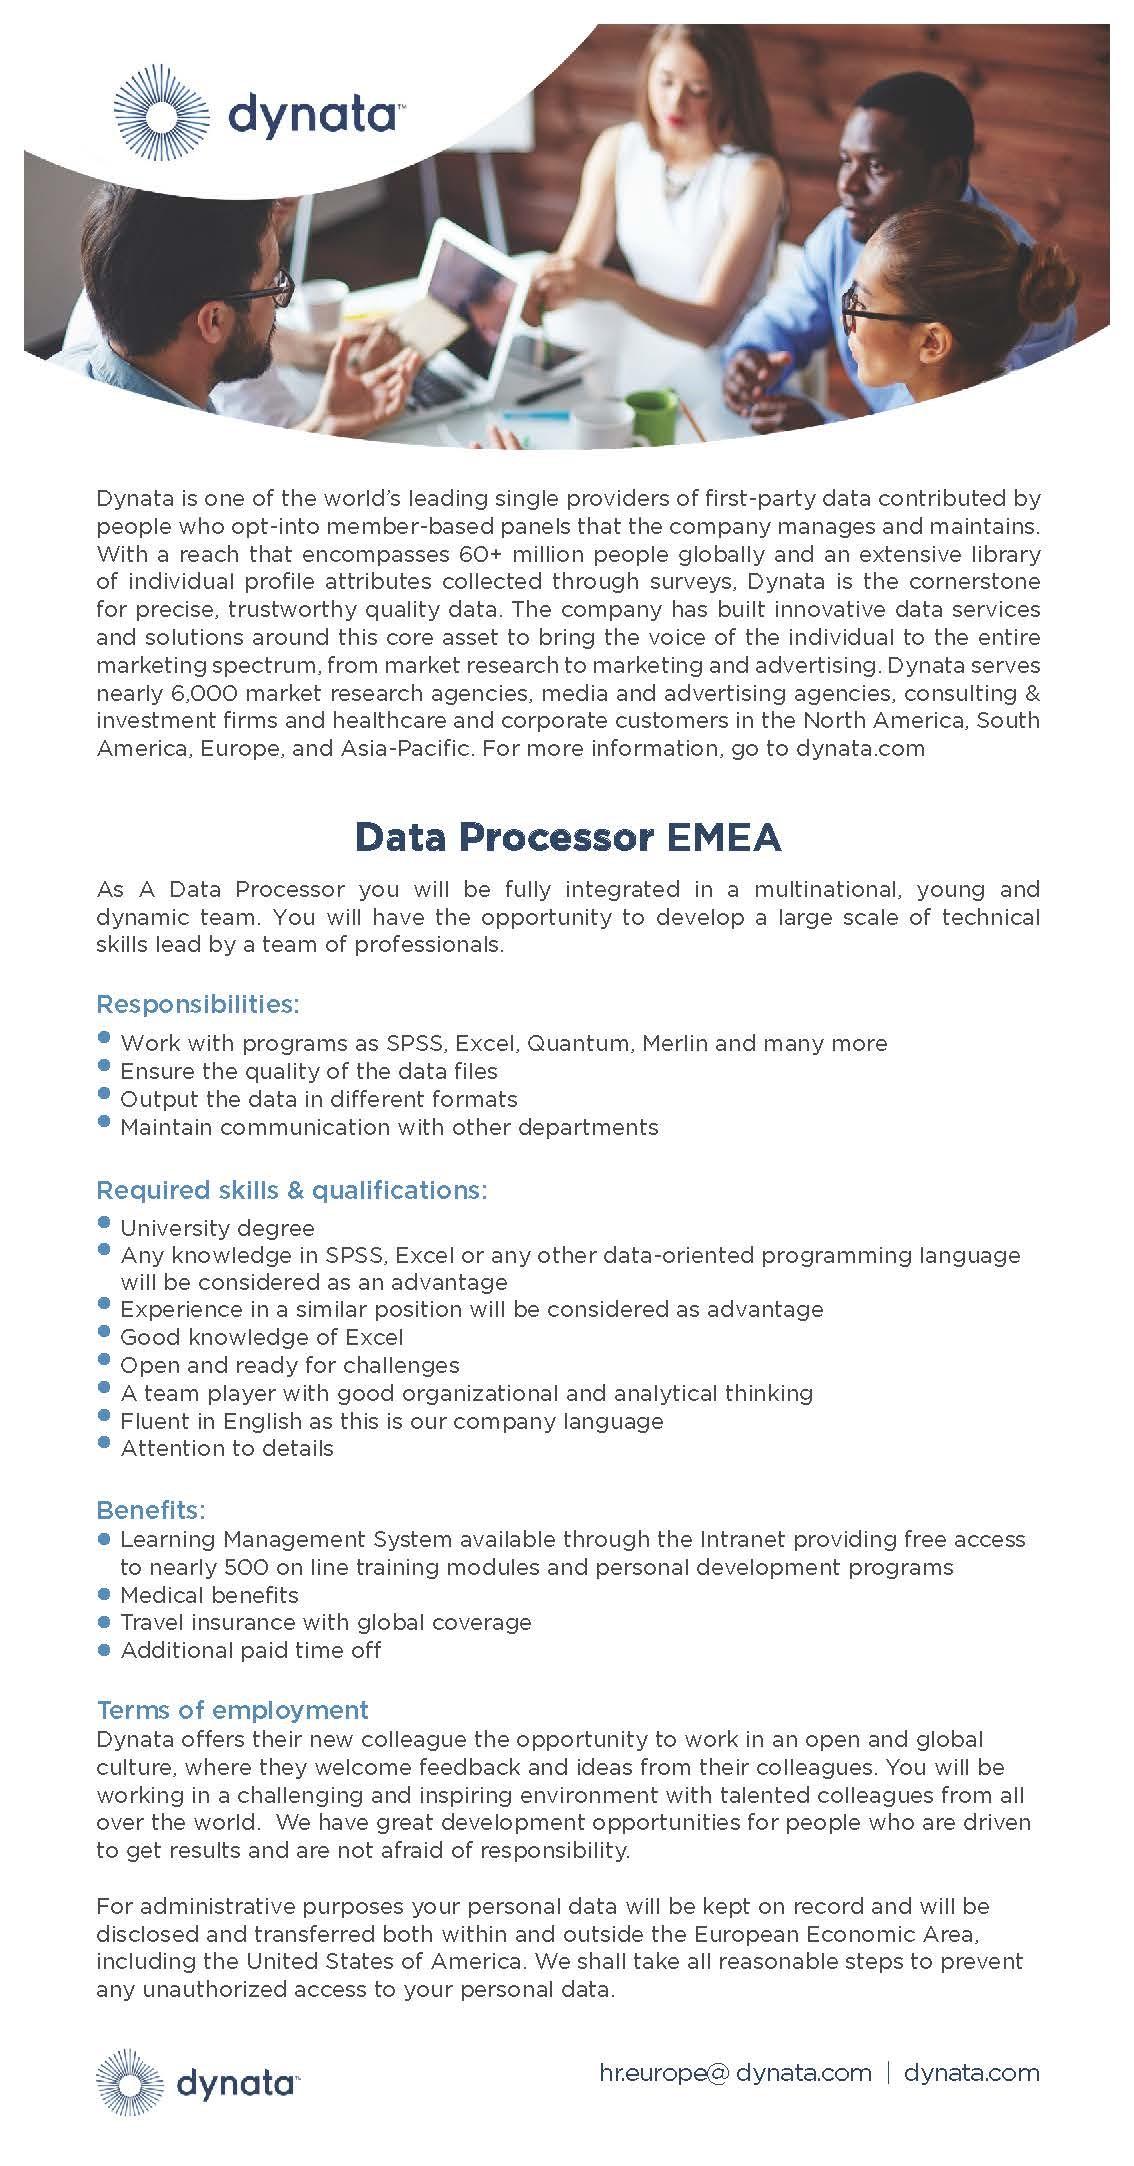 DataProcessor_EMEA